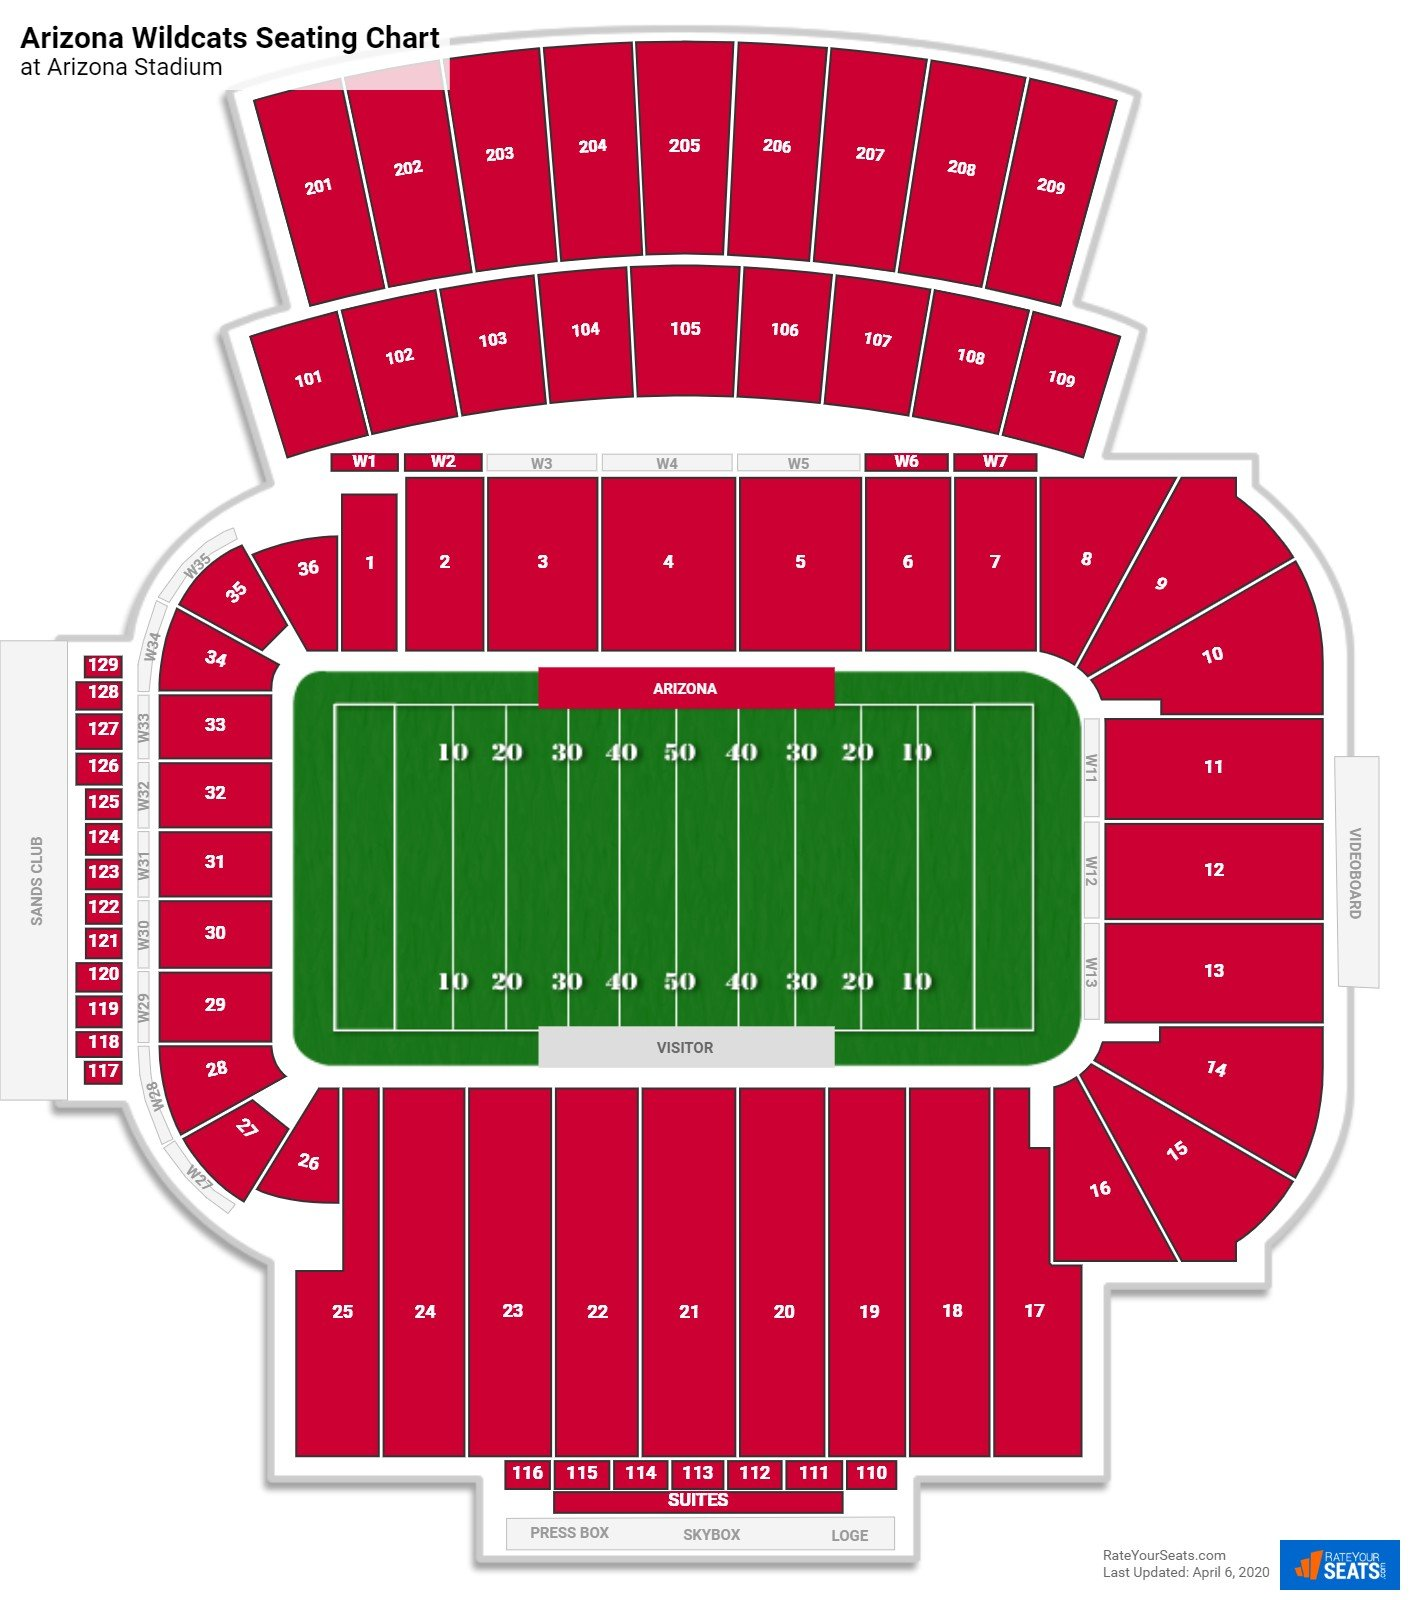 Arizona Stadium Section 6 - RateYourSeats.com